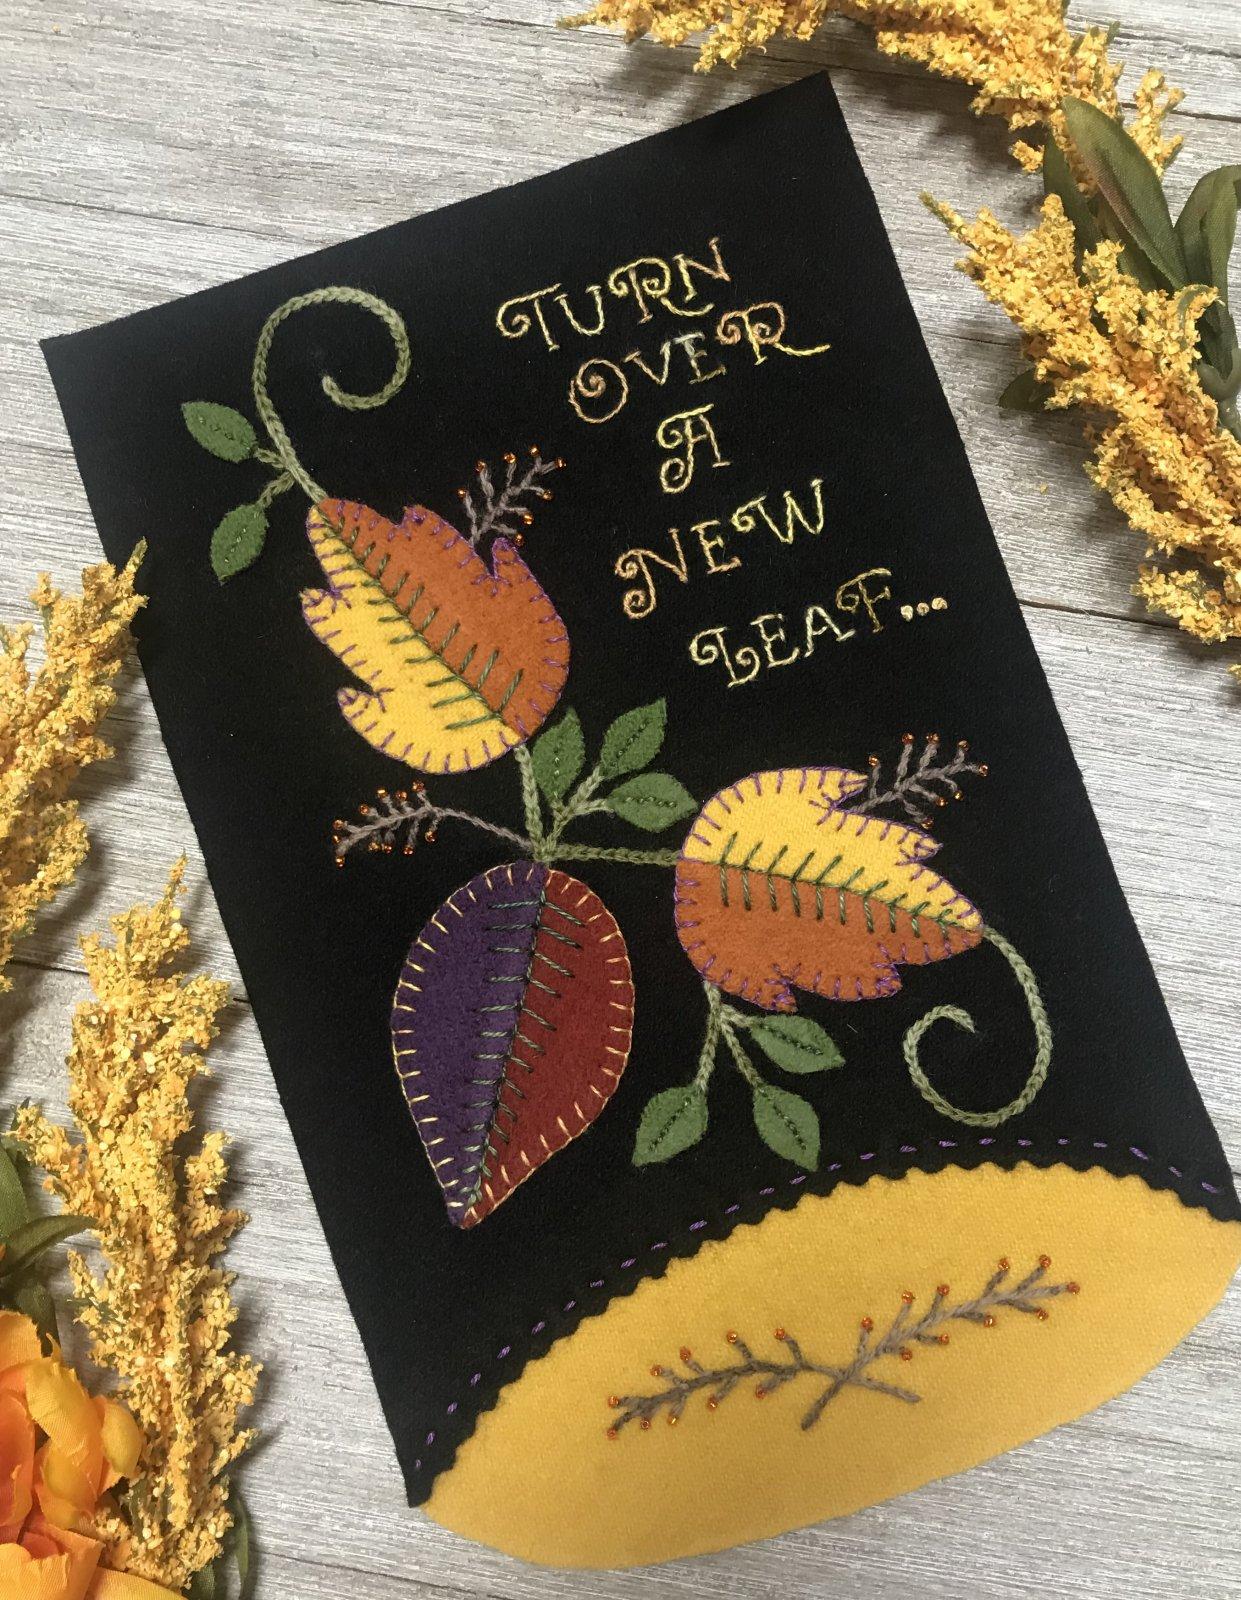 Graceful Words Block 9 New Leaf